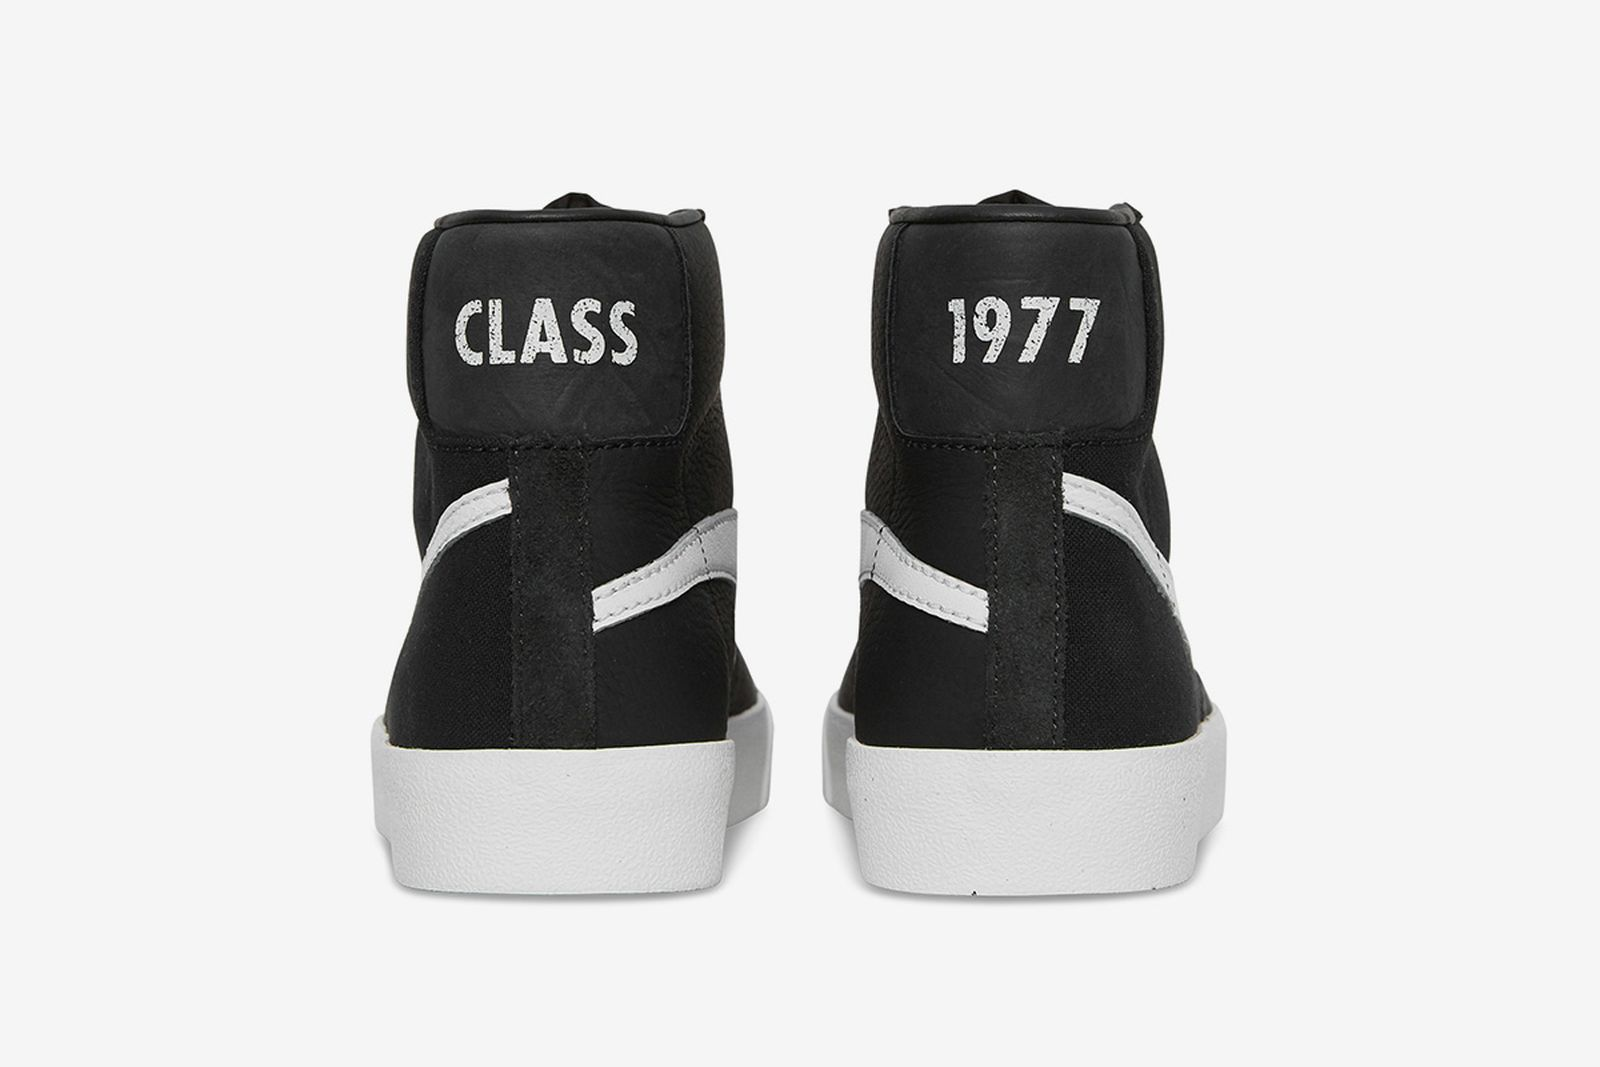 slam-jam-nike-blazer-mid-class-77-release-date-price-1-05